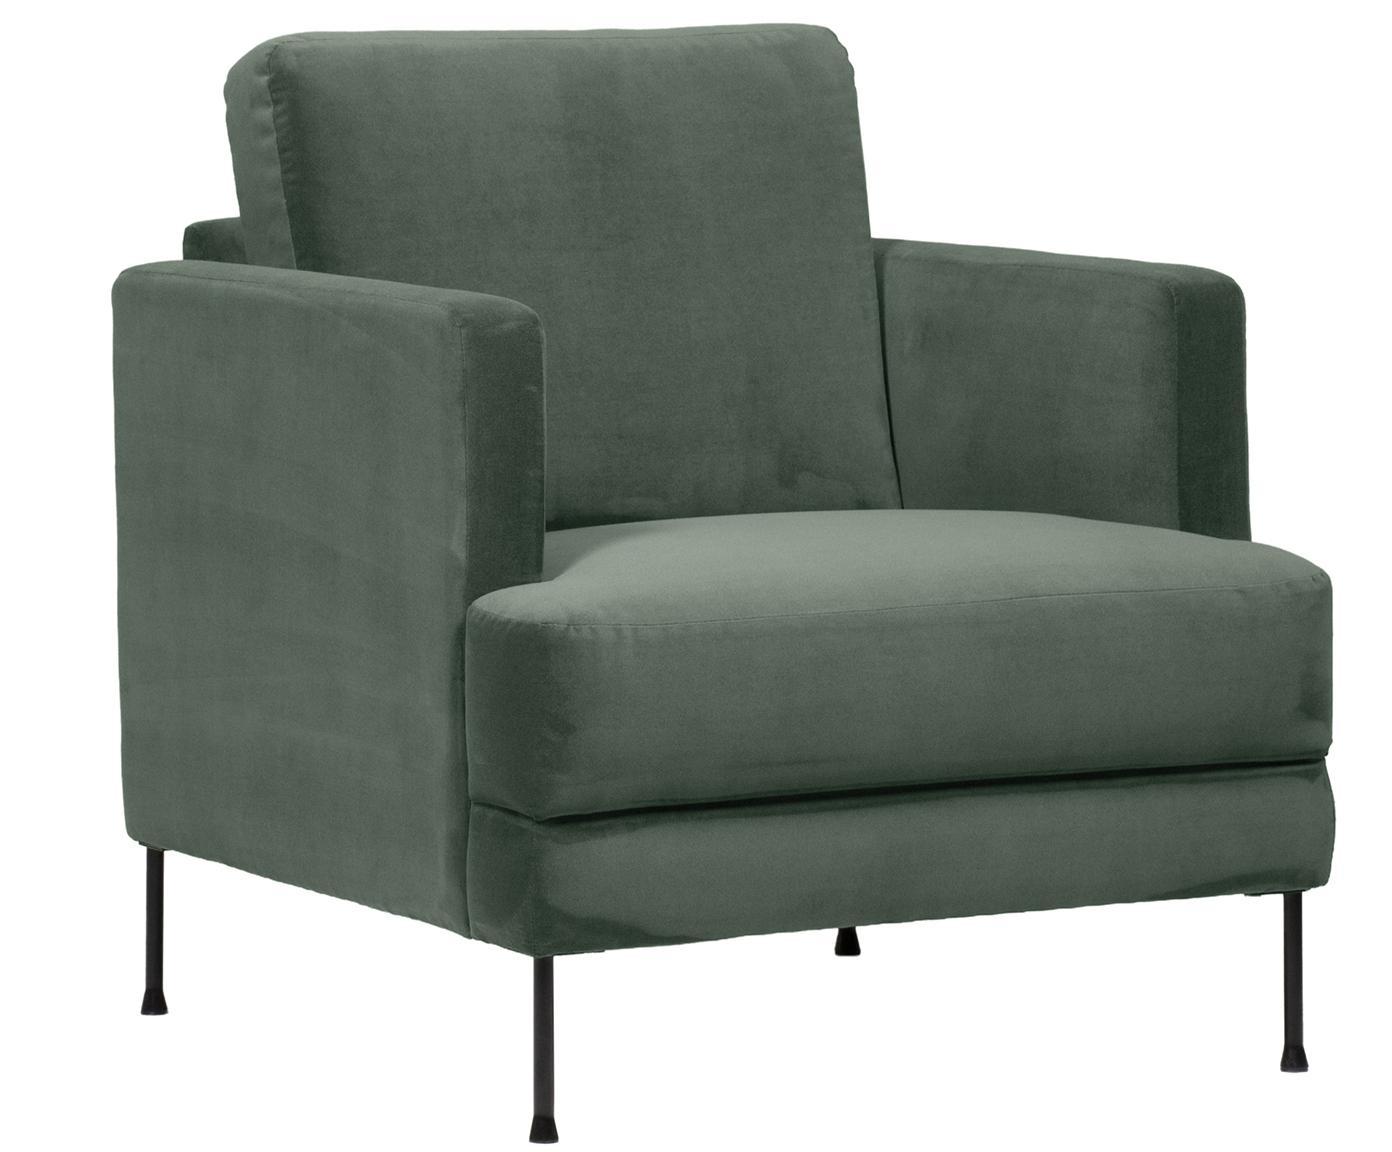 Samt-Sessel Fluente, Bezug: Samt (Hochwertiger Polyes, Gestell: Massives Kiefernholz, Samt Grün, B 76 x T 83 cm